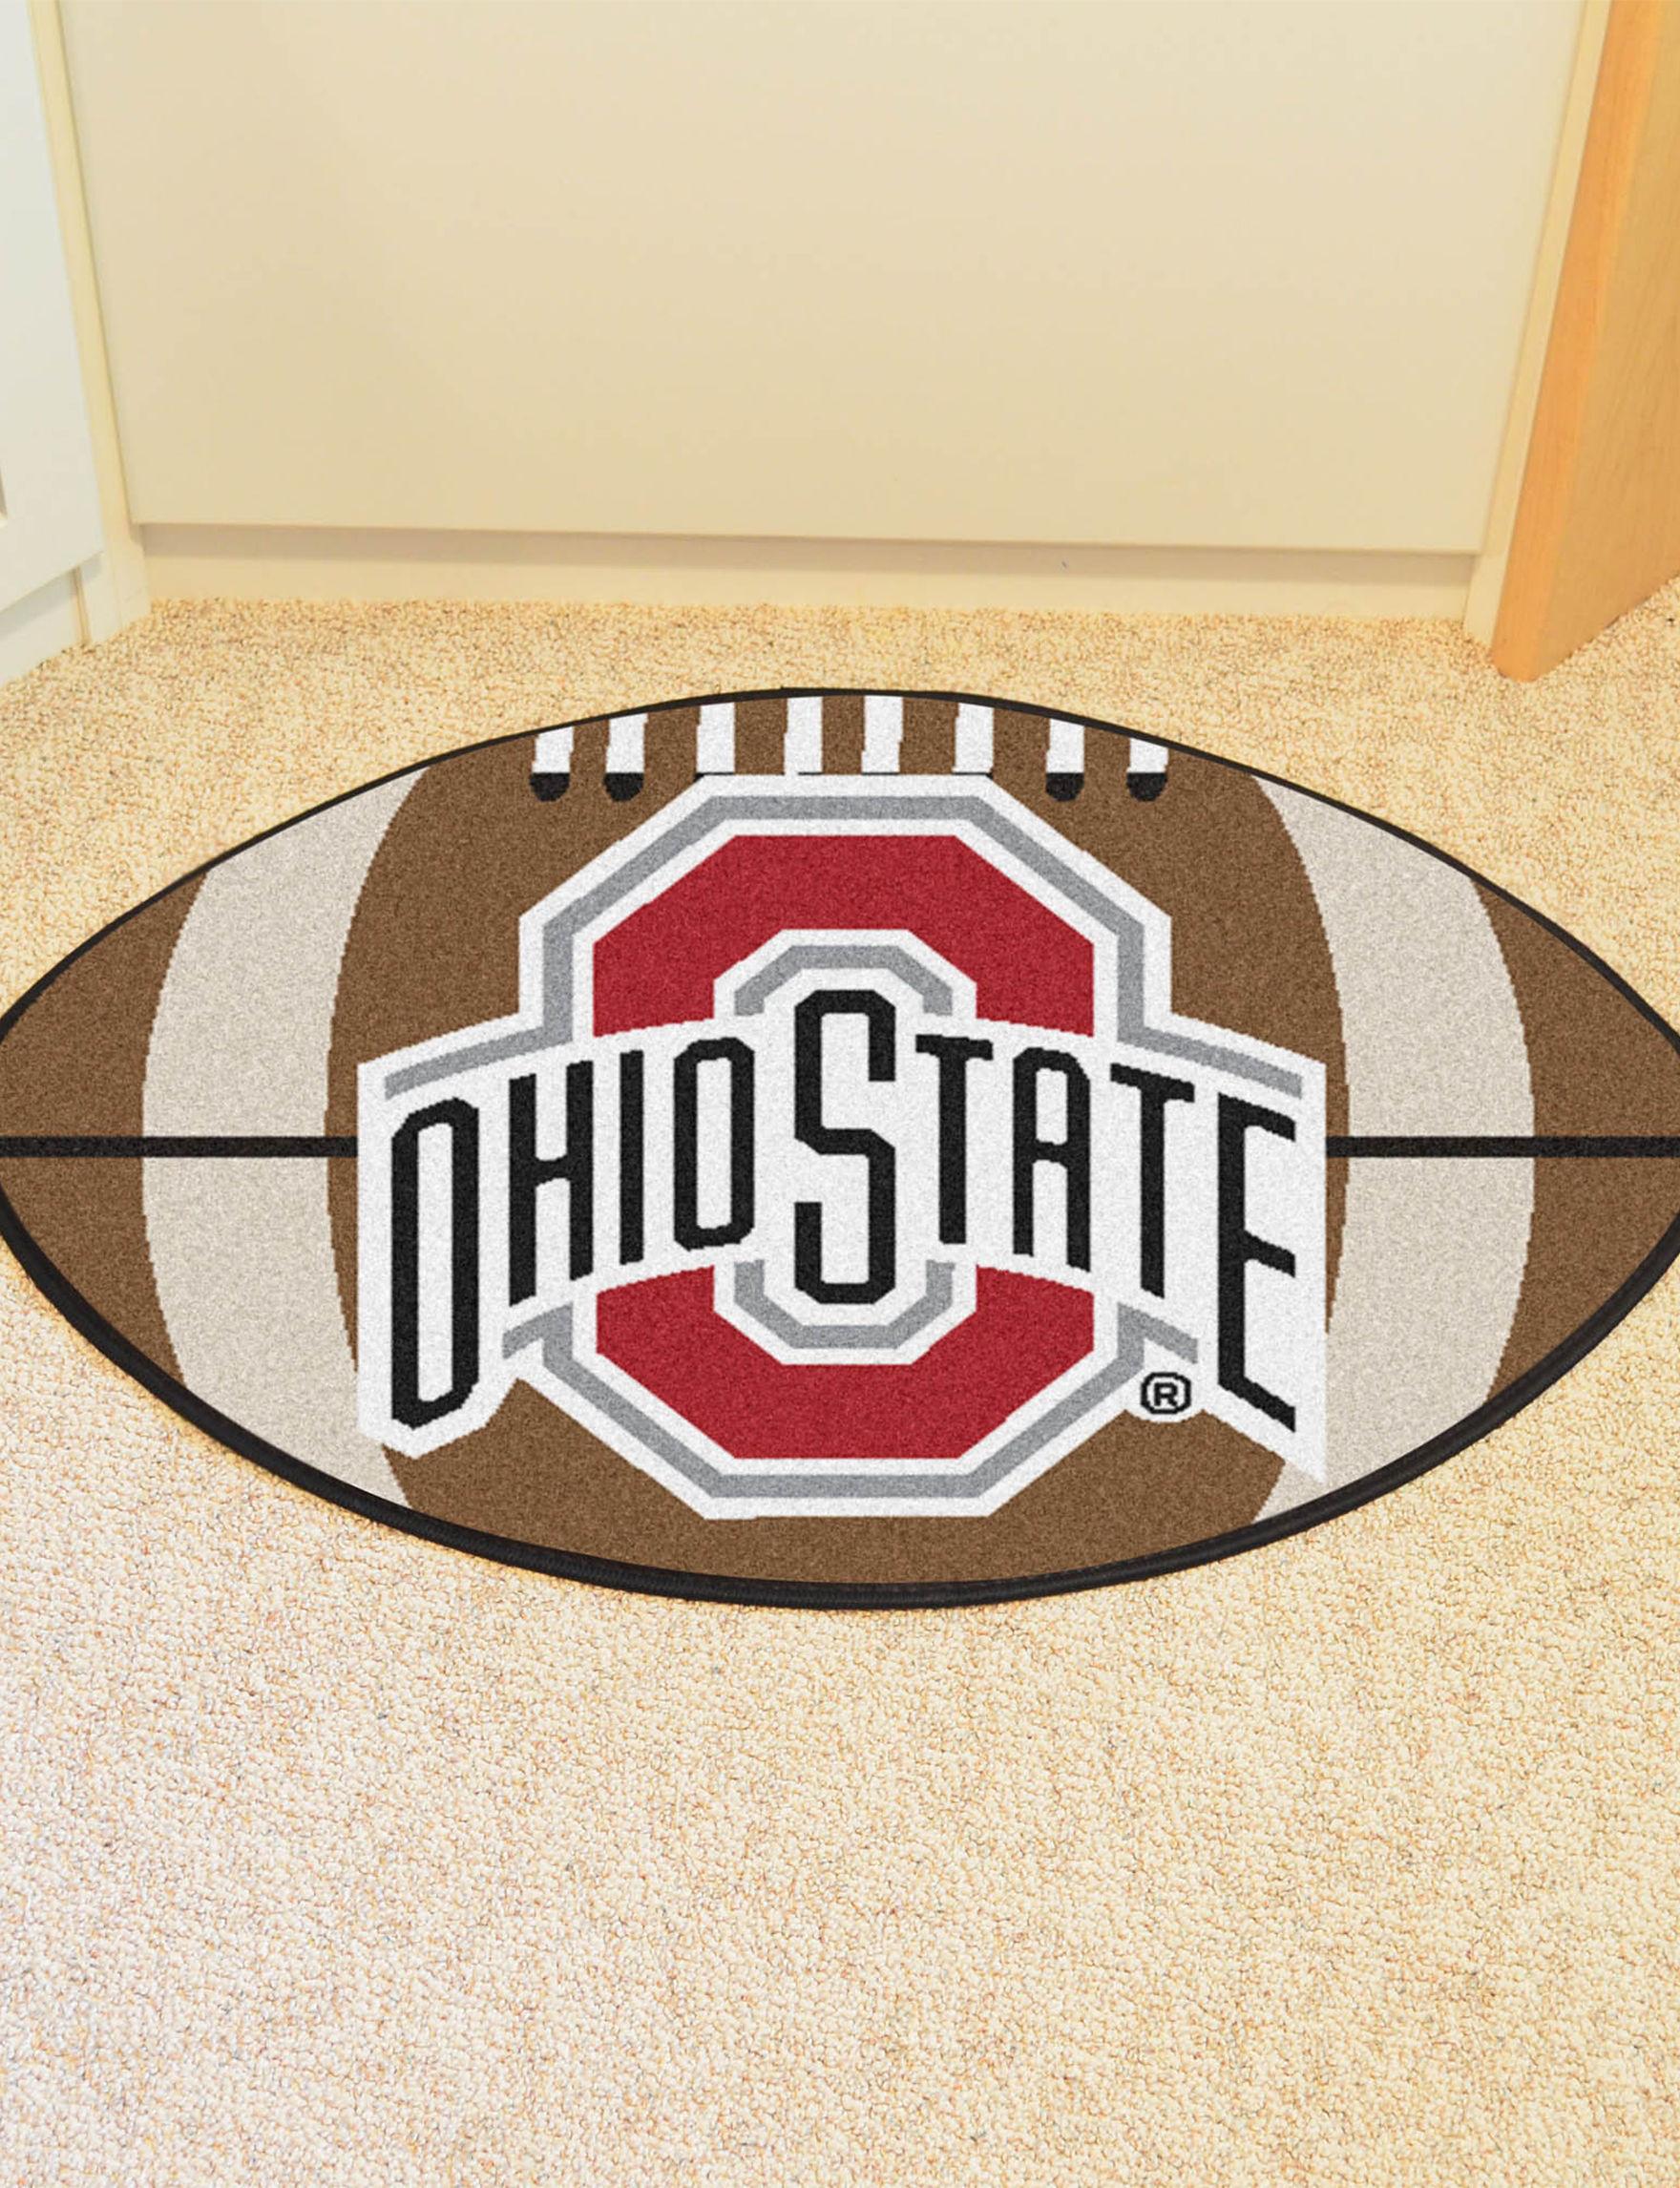 Fanmats Brown Accent Rugs Outdoor Rugs & Doormats NCAA Outdoor Decor Rugs